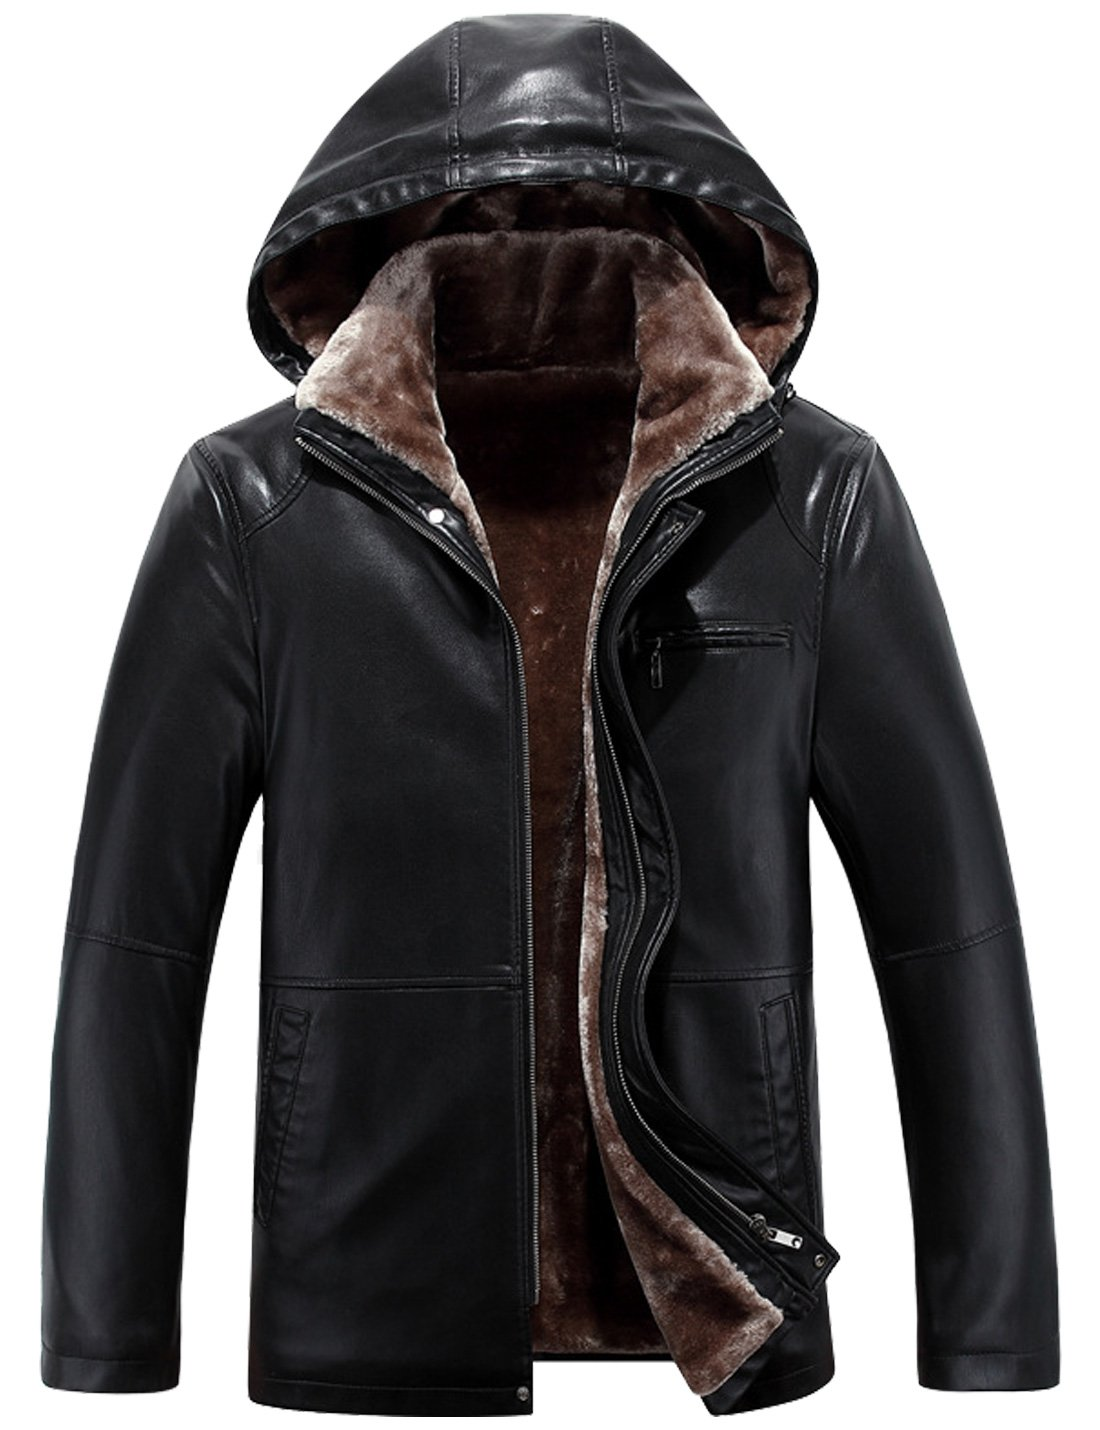 Yeokou Men's Winter Warm Leather Coat Real Fur Hooded Leather Jacket Black112 M